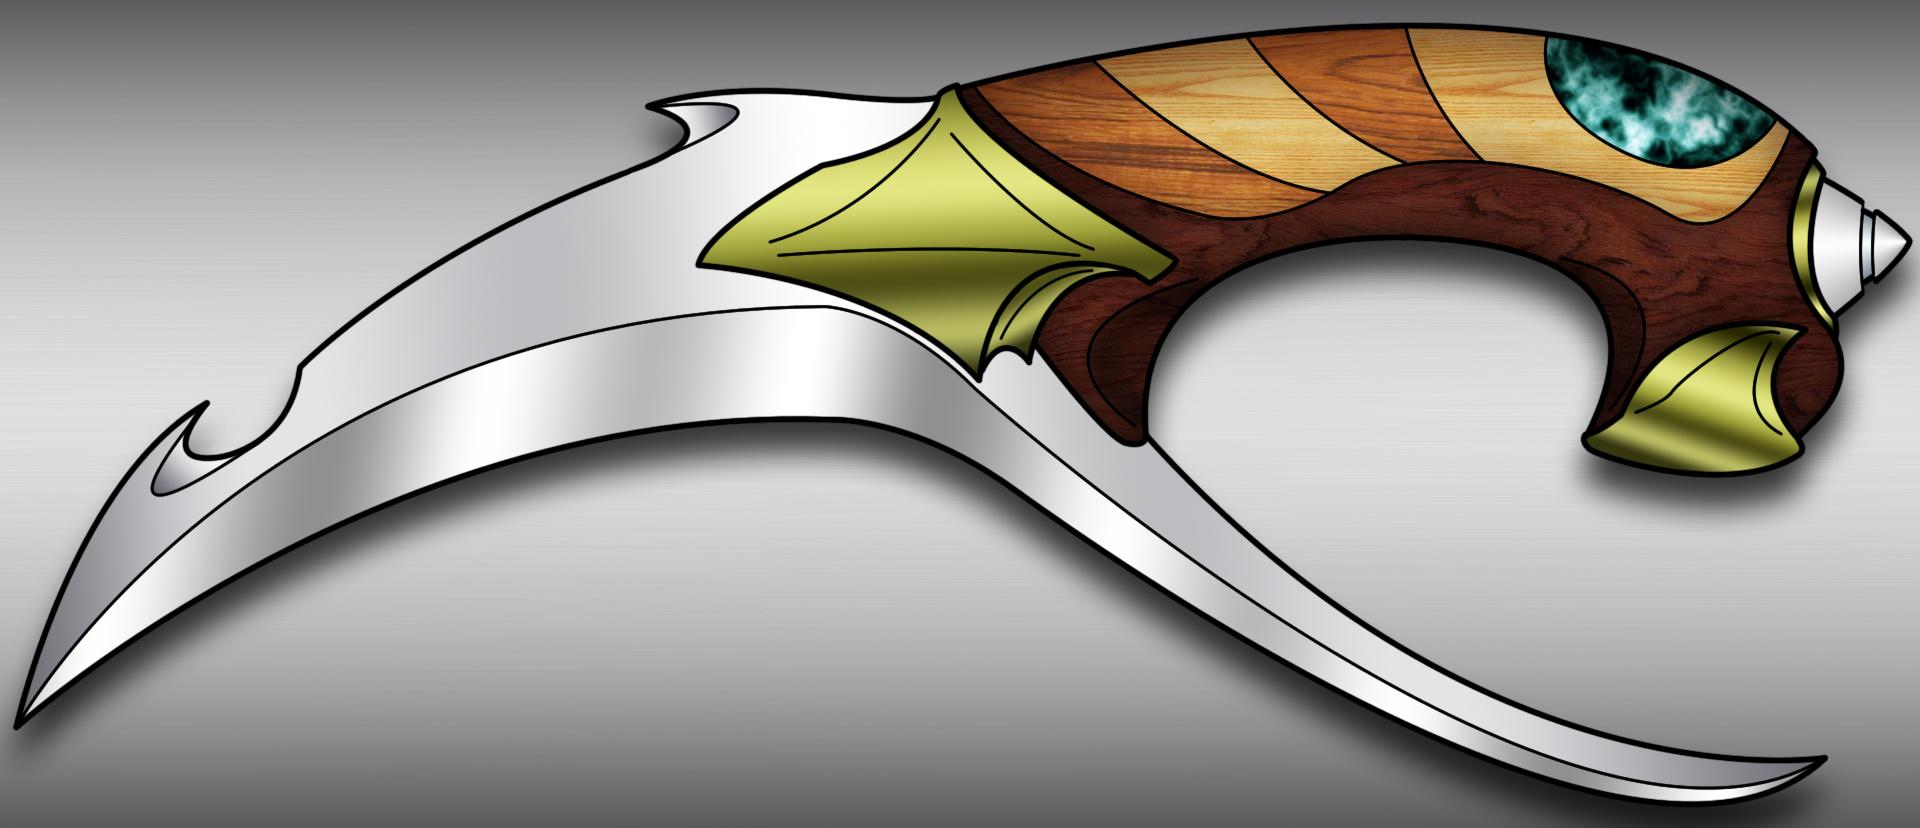 Knife Design By Balsavor On Deviantart